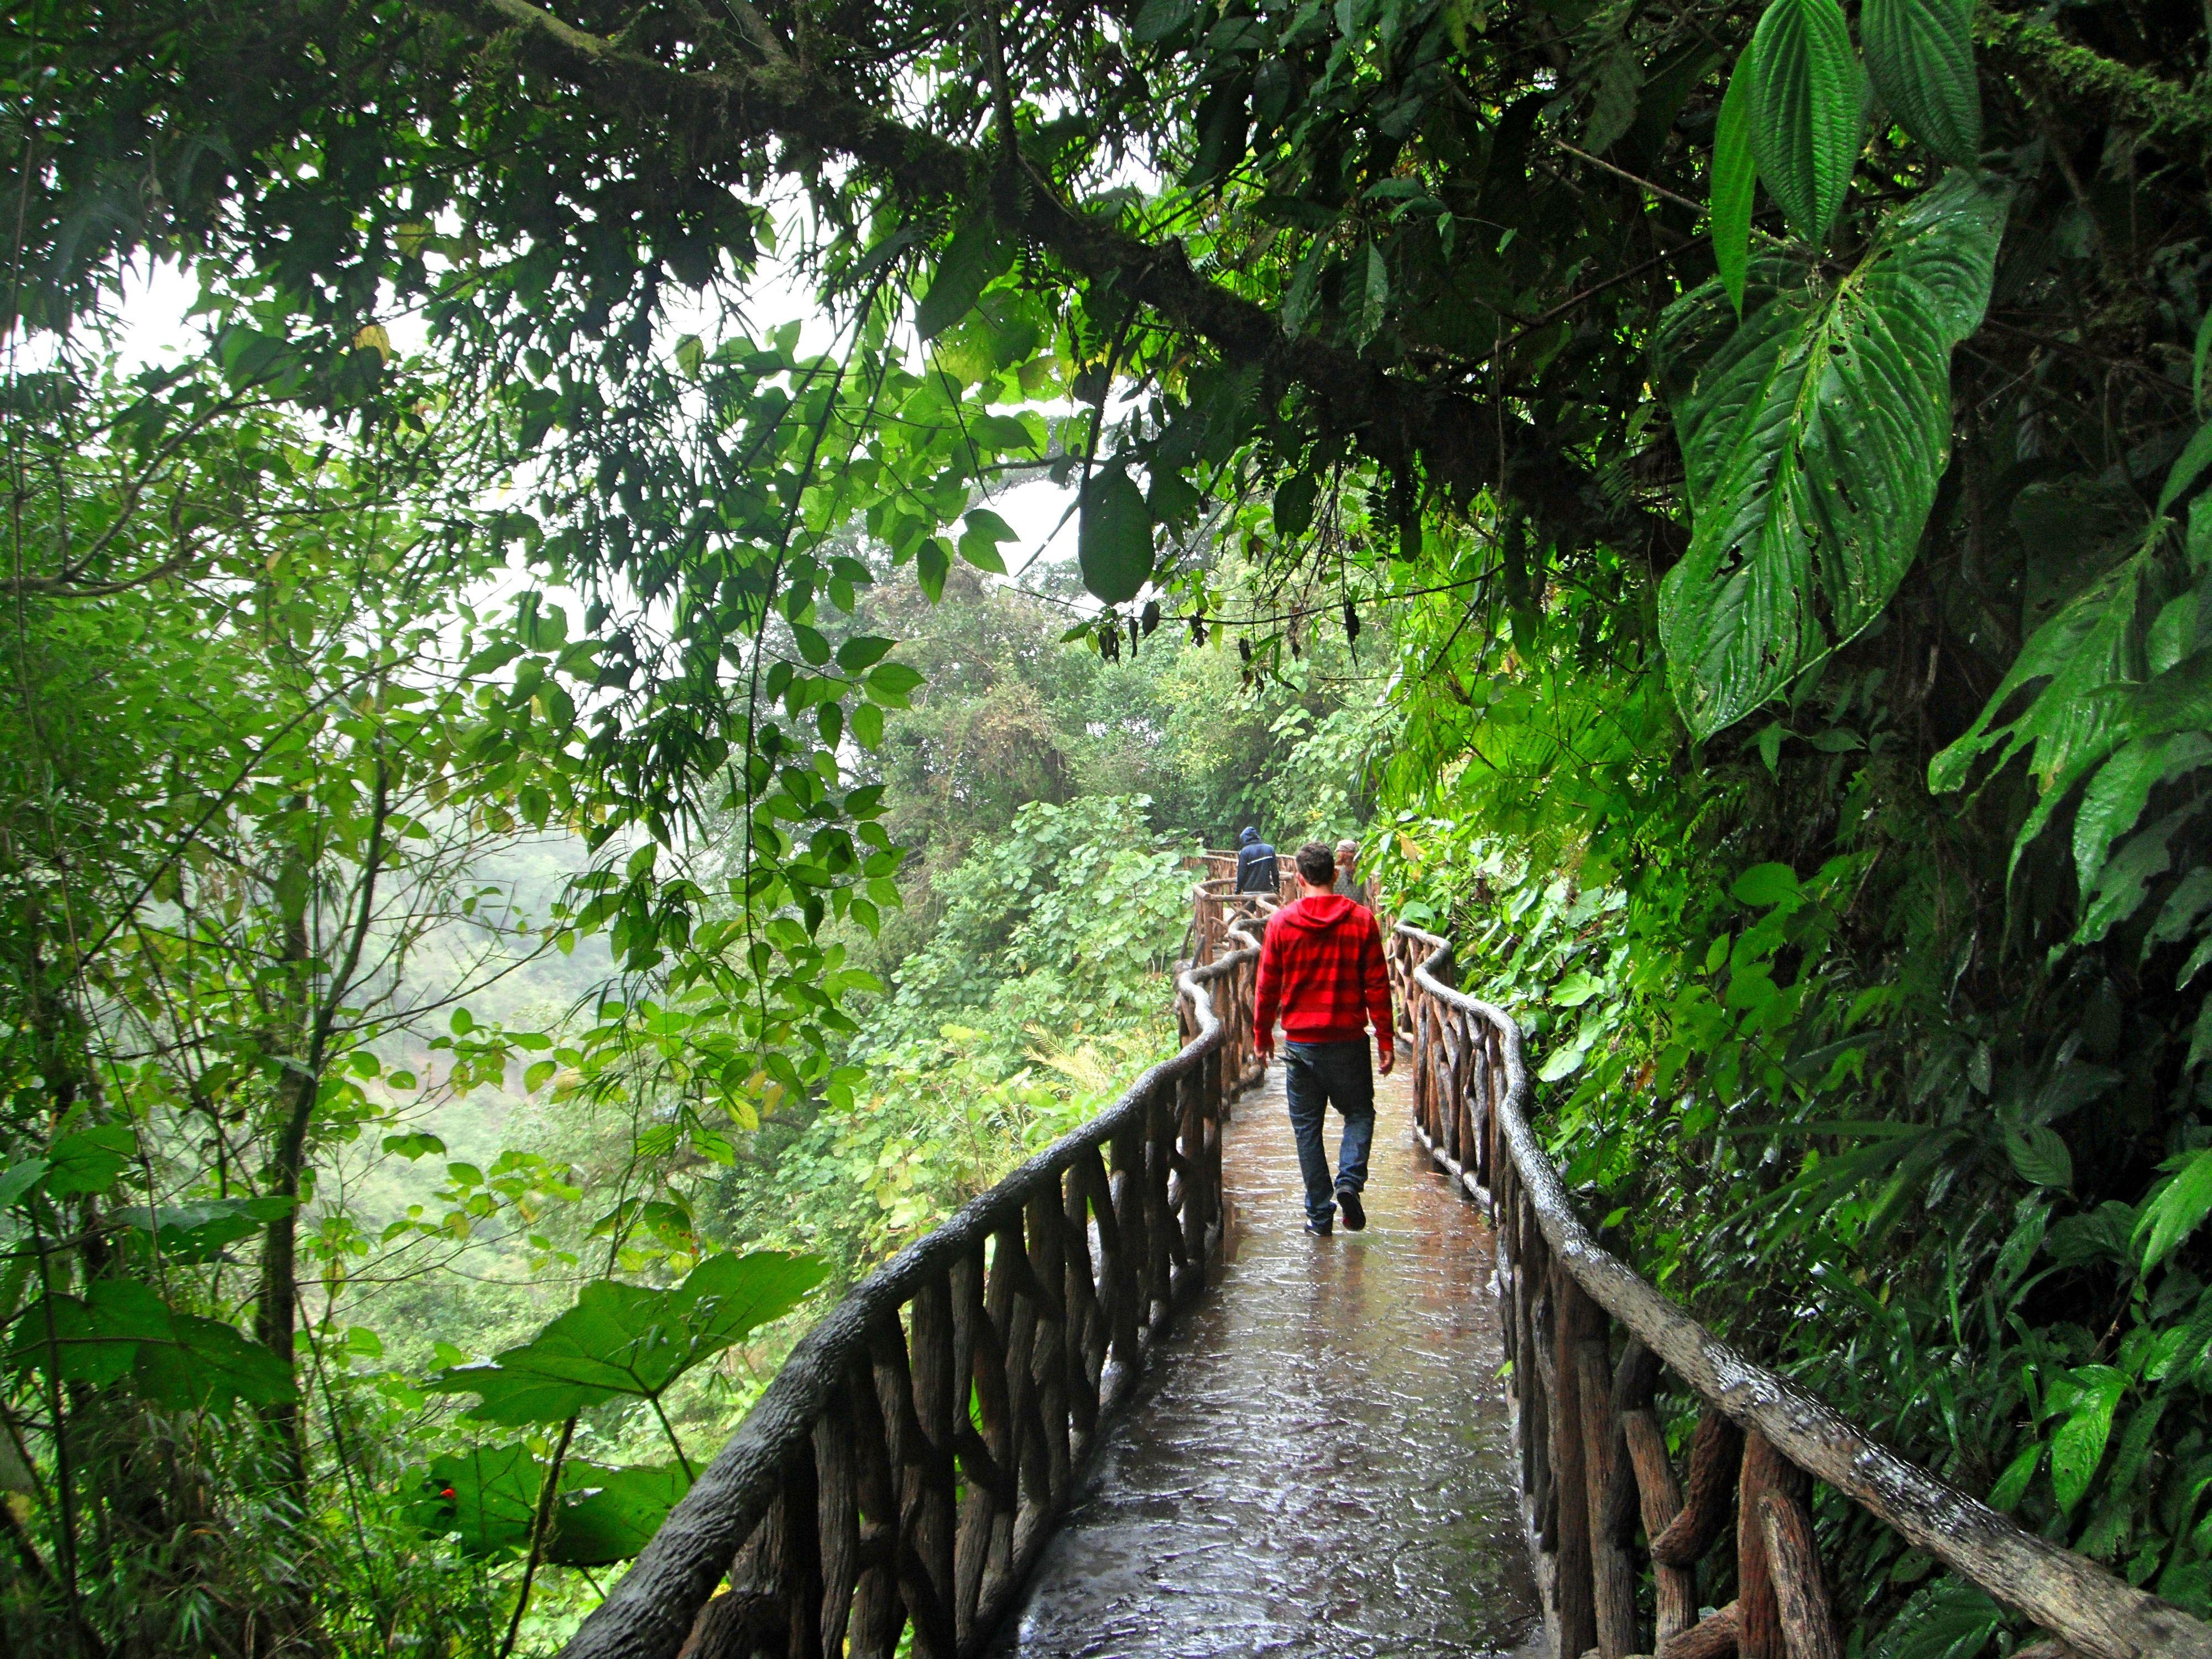 3805d498cf8ac34fc8705e381fb64ae2 - La Paz Waterfall Gardens Tour From San Jose